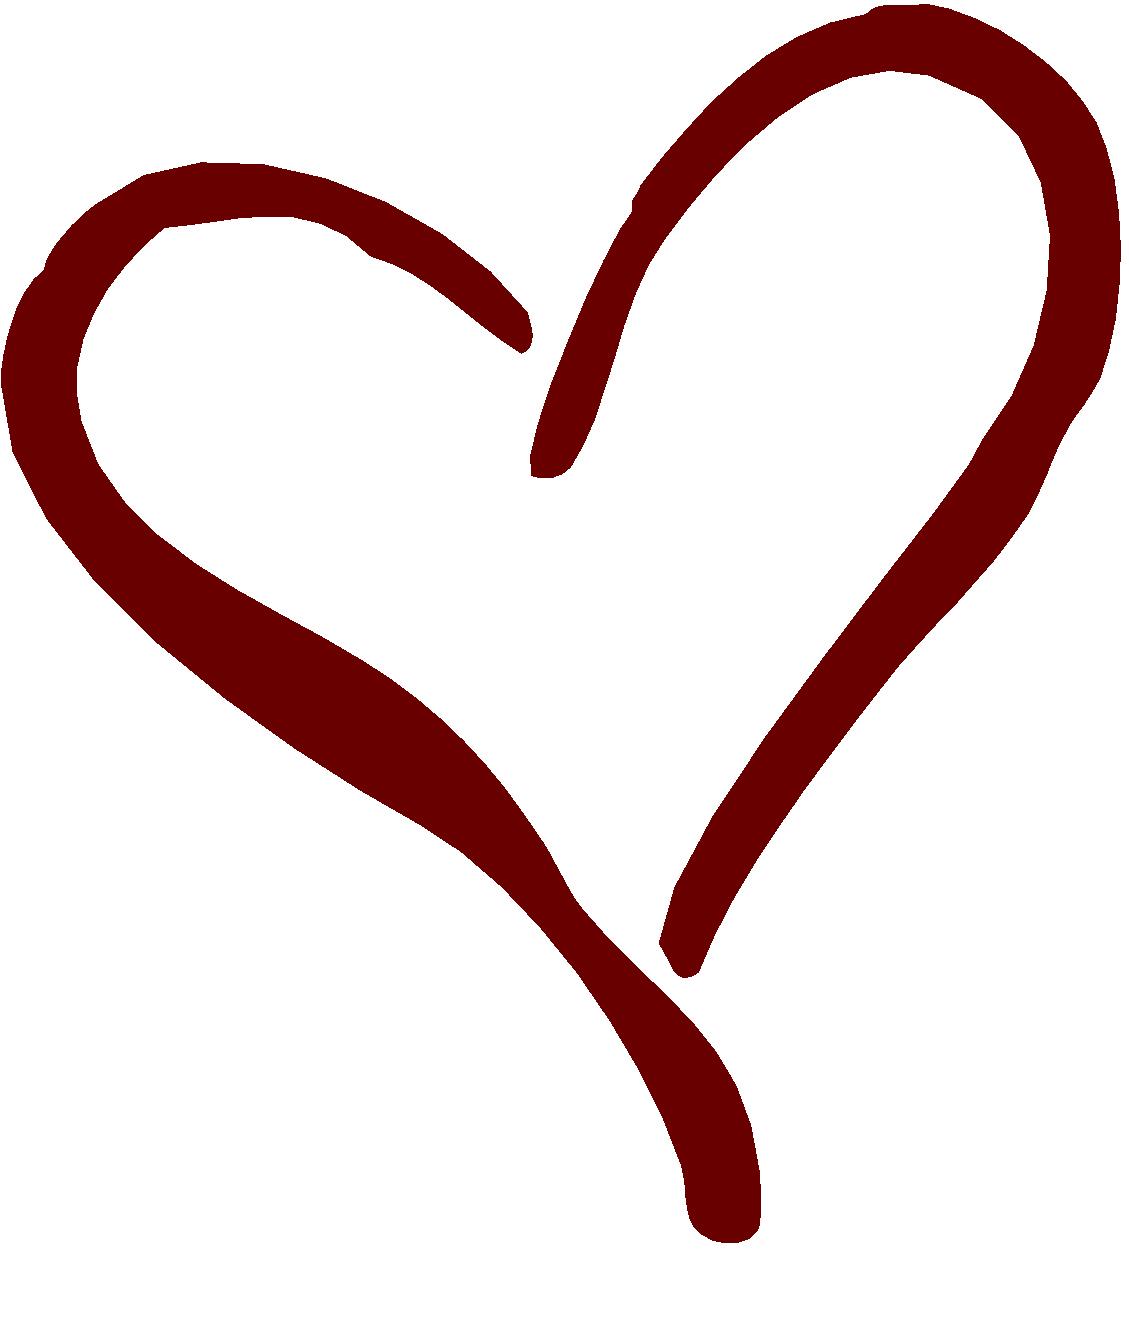 Black heart clipart 11